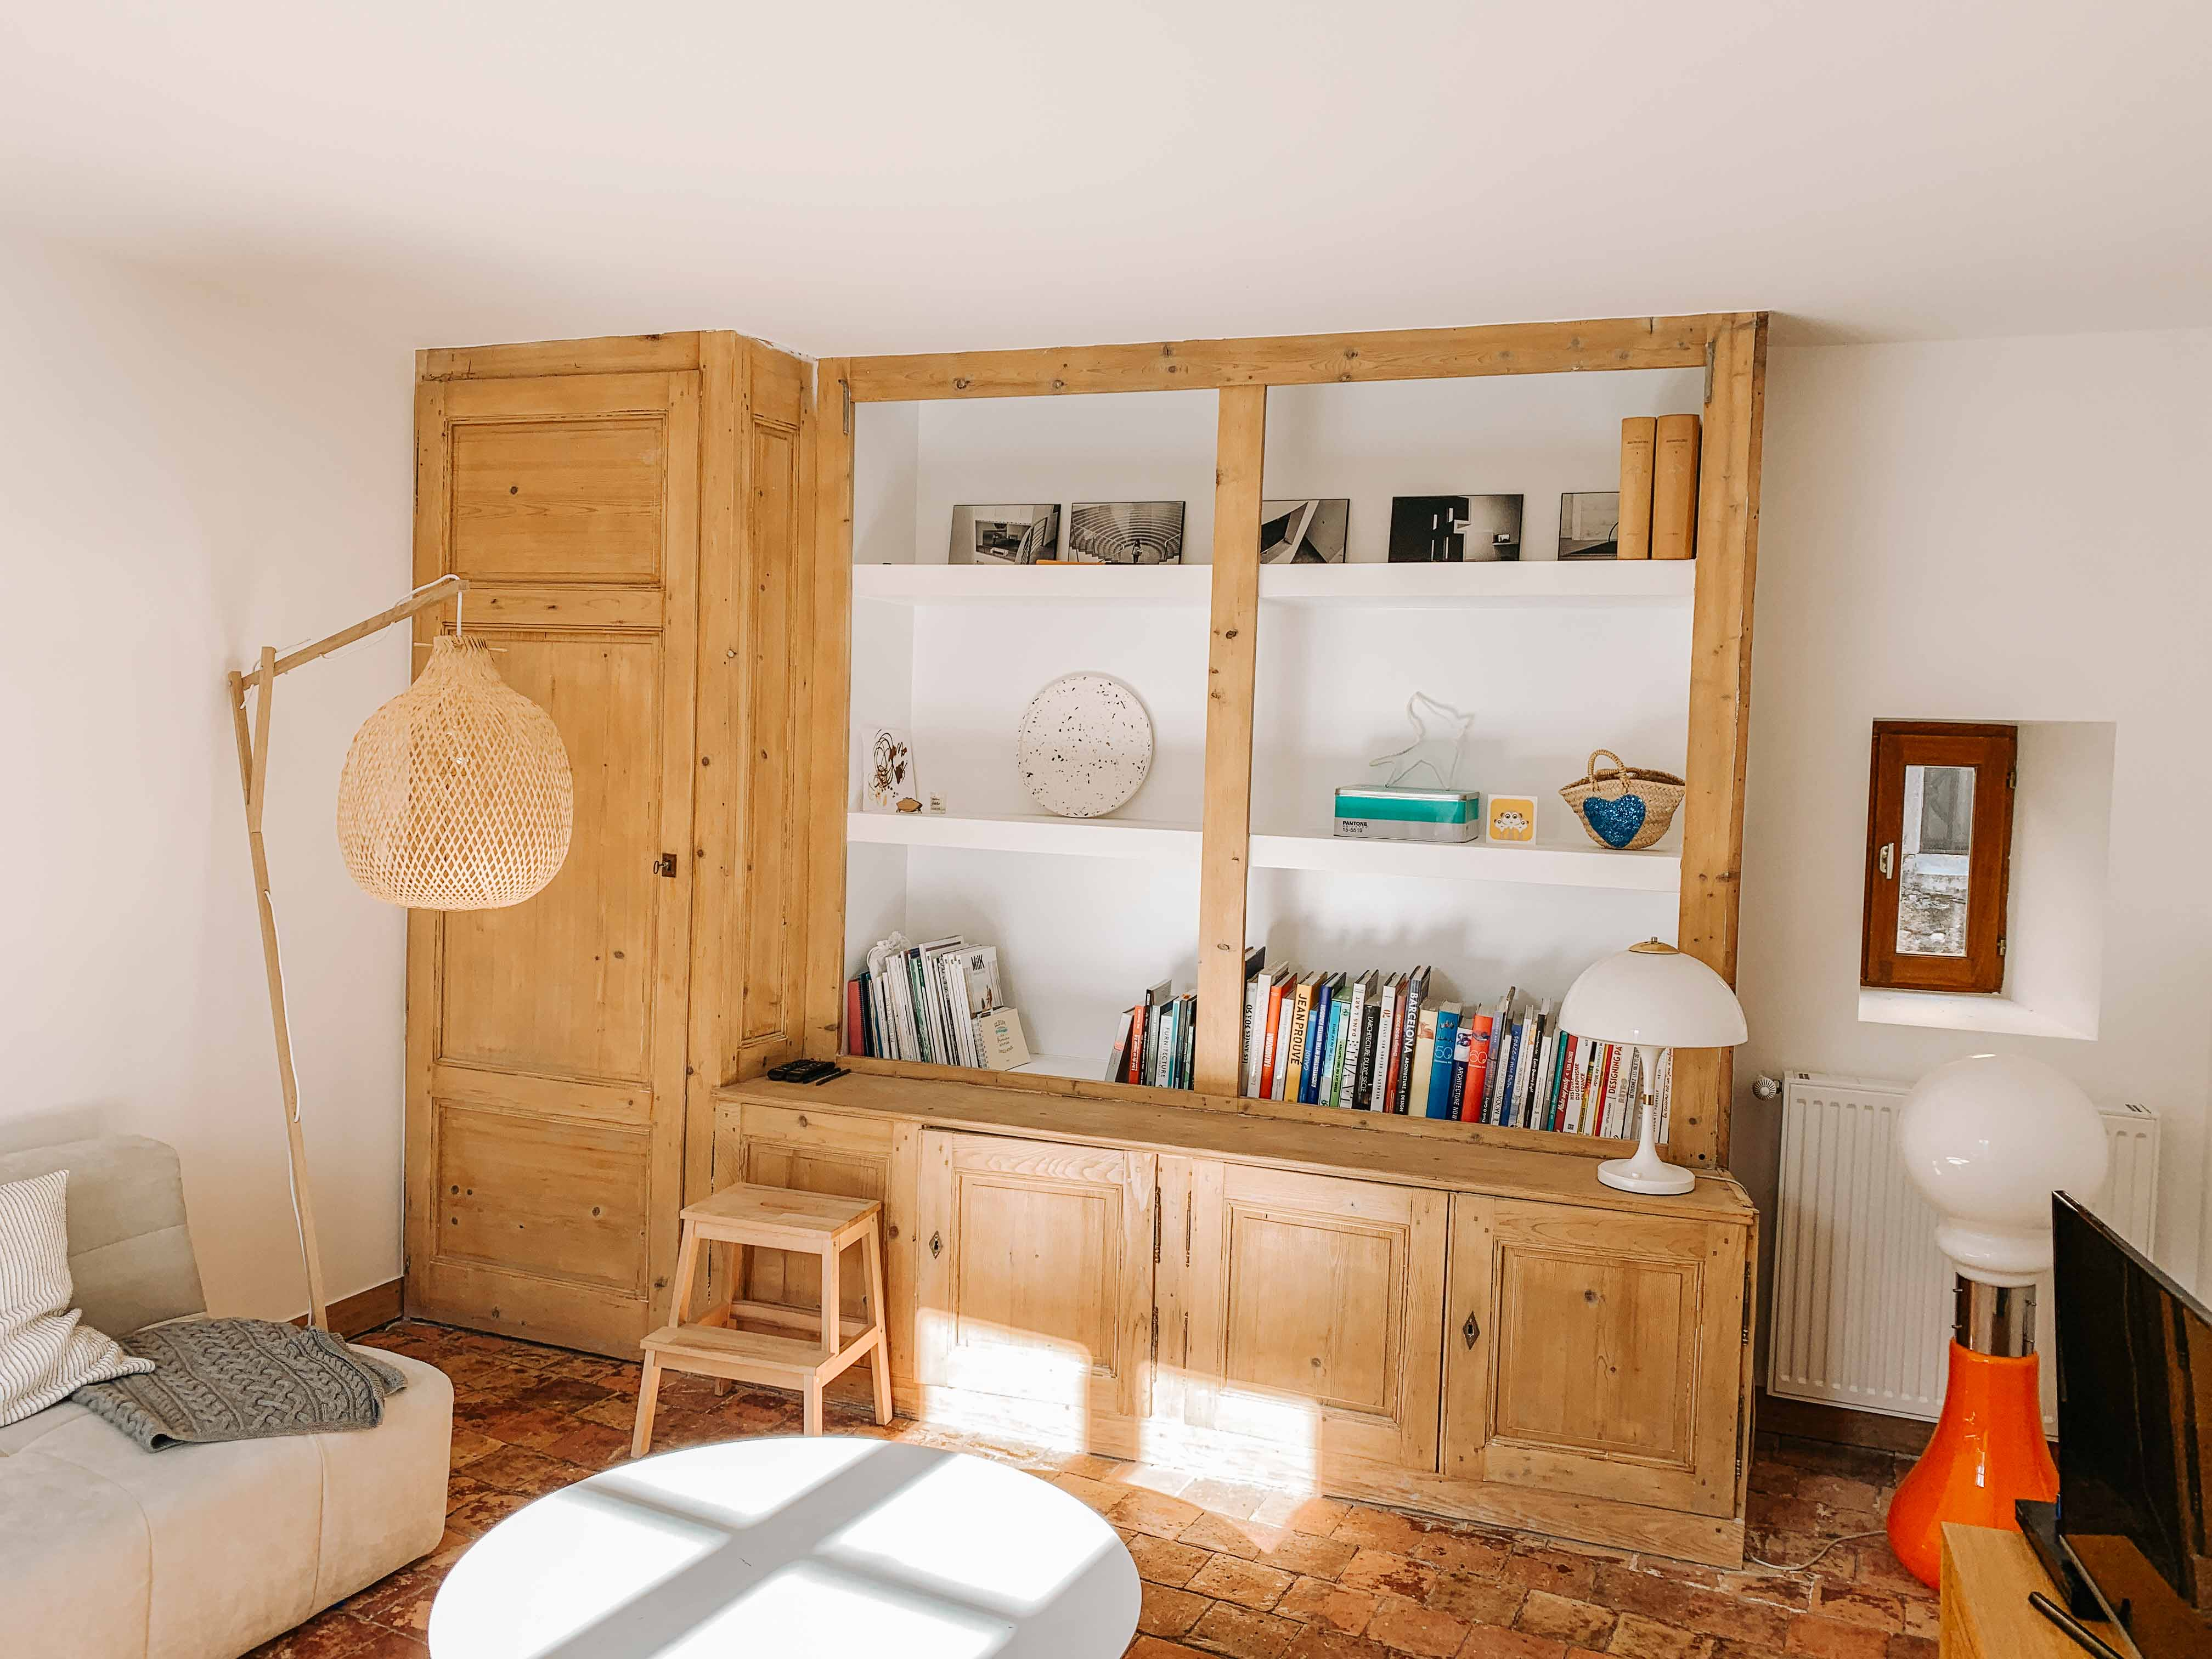 architecte-lyon-rénovation-presbytere-marcilly-azergues-pierre-dorée-25